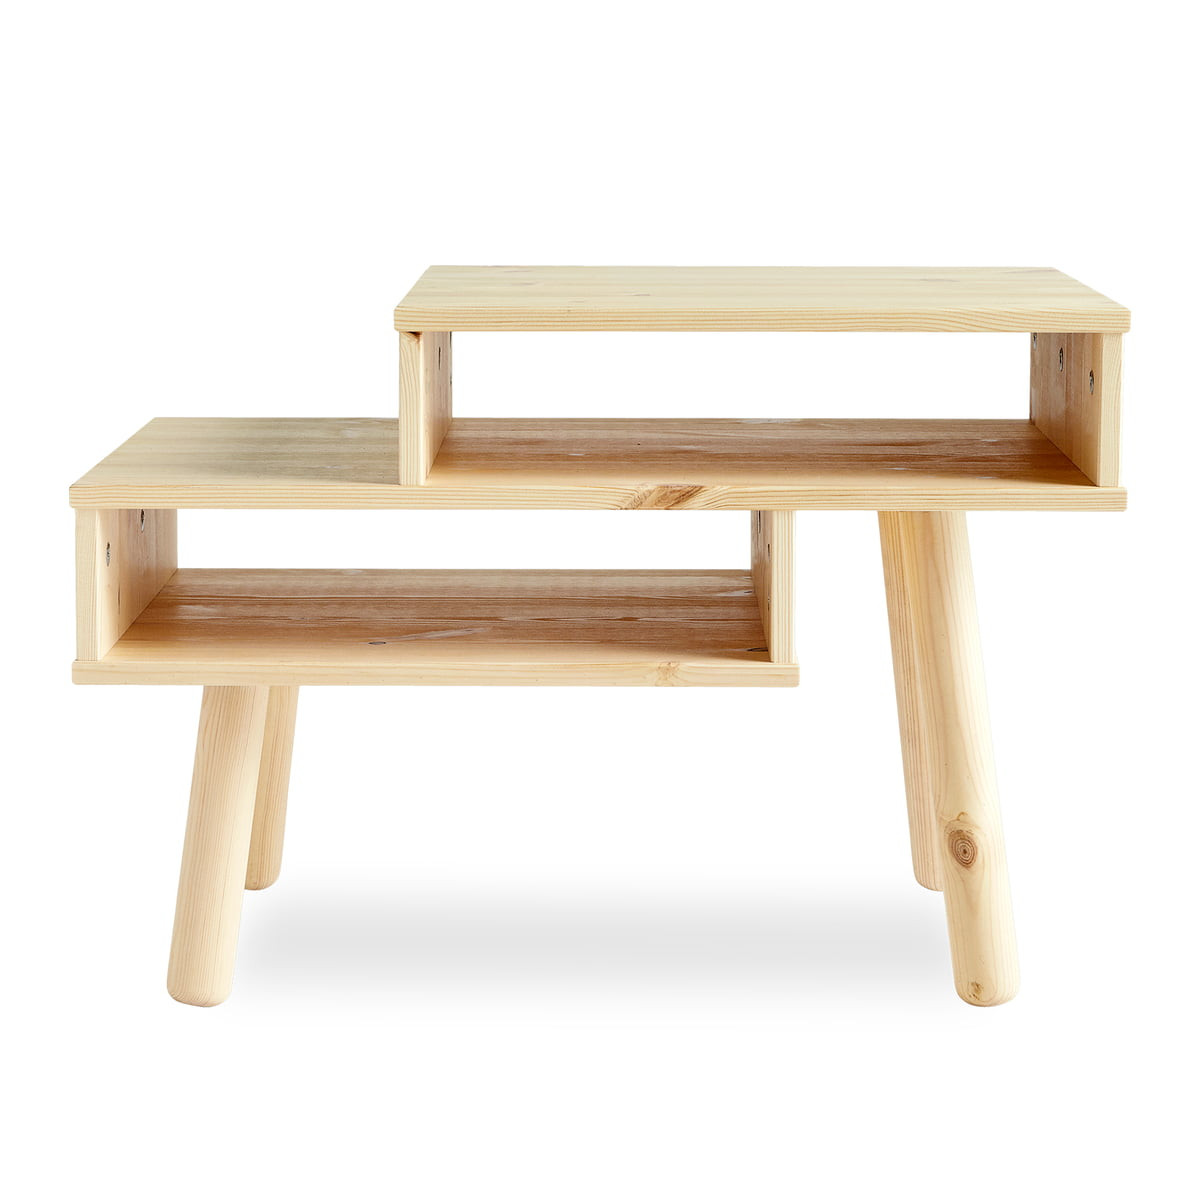 Beistelltisch Hako | Helles Holz